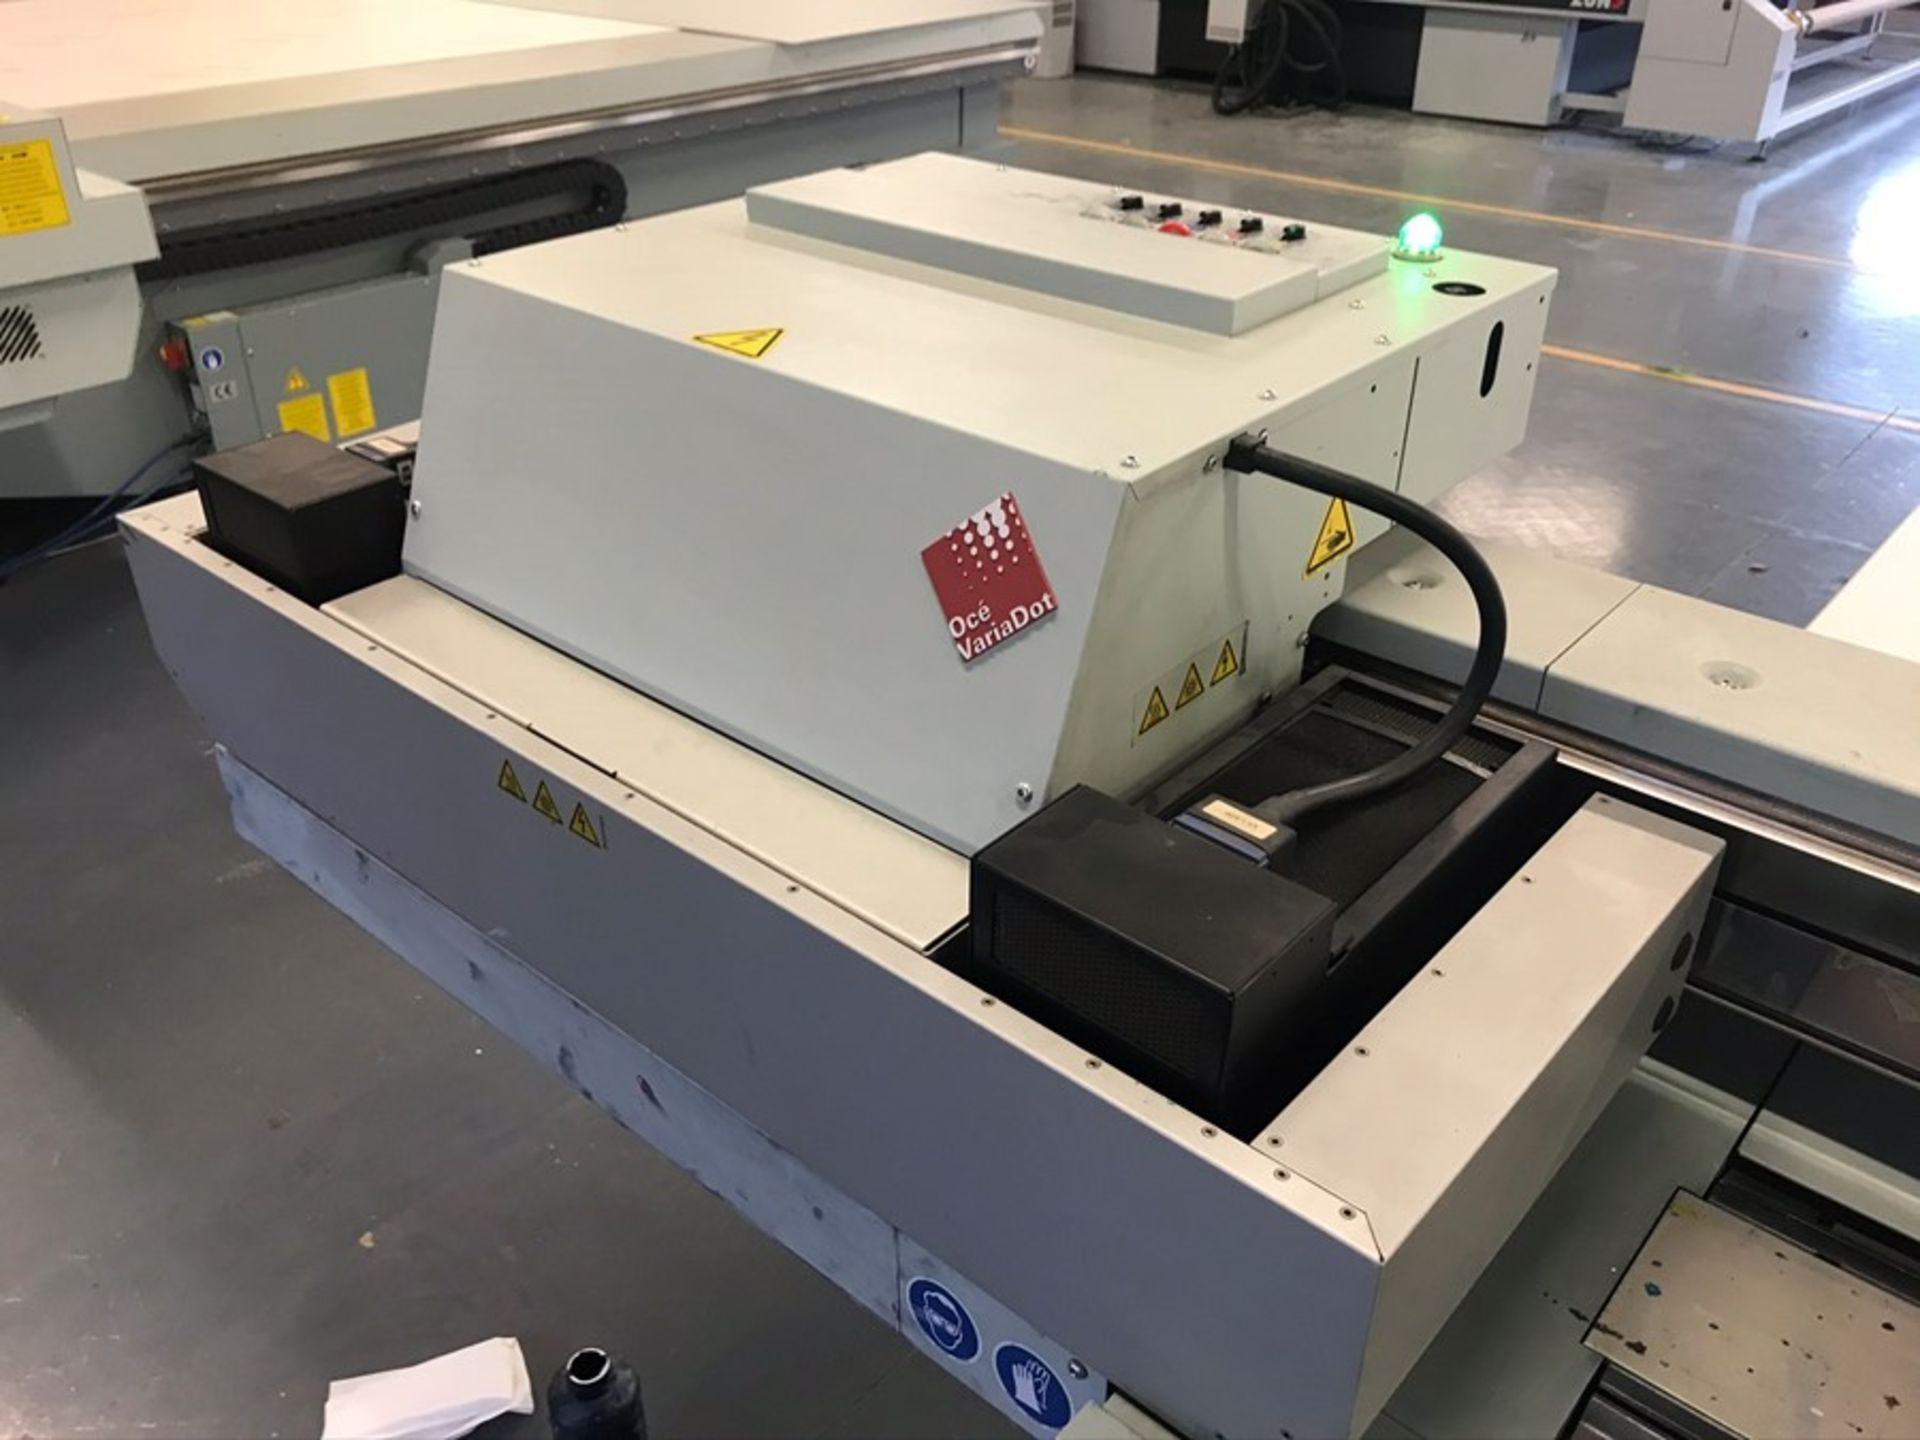 Oce Arizona 550XT + WIO UV flatbed printer (2013) - Image 10 of 22